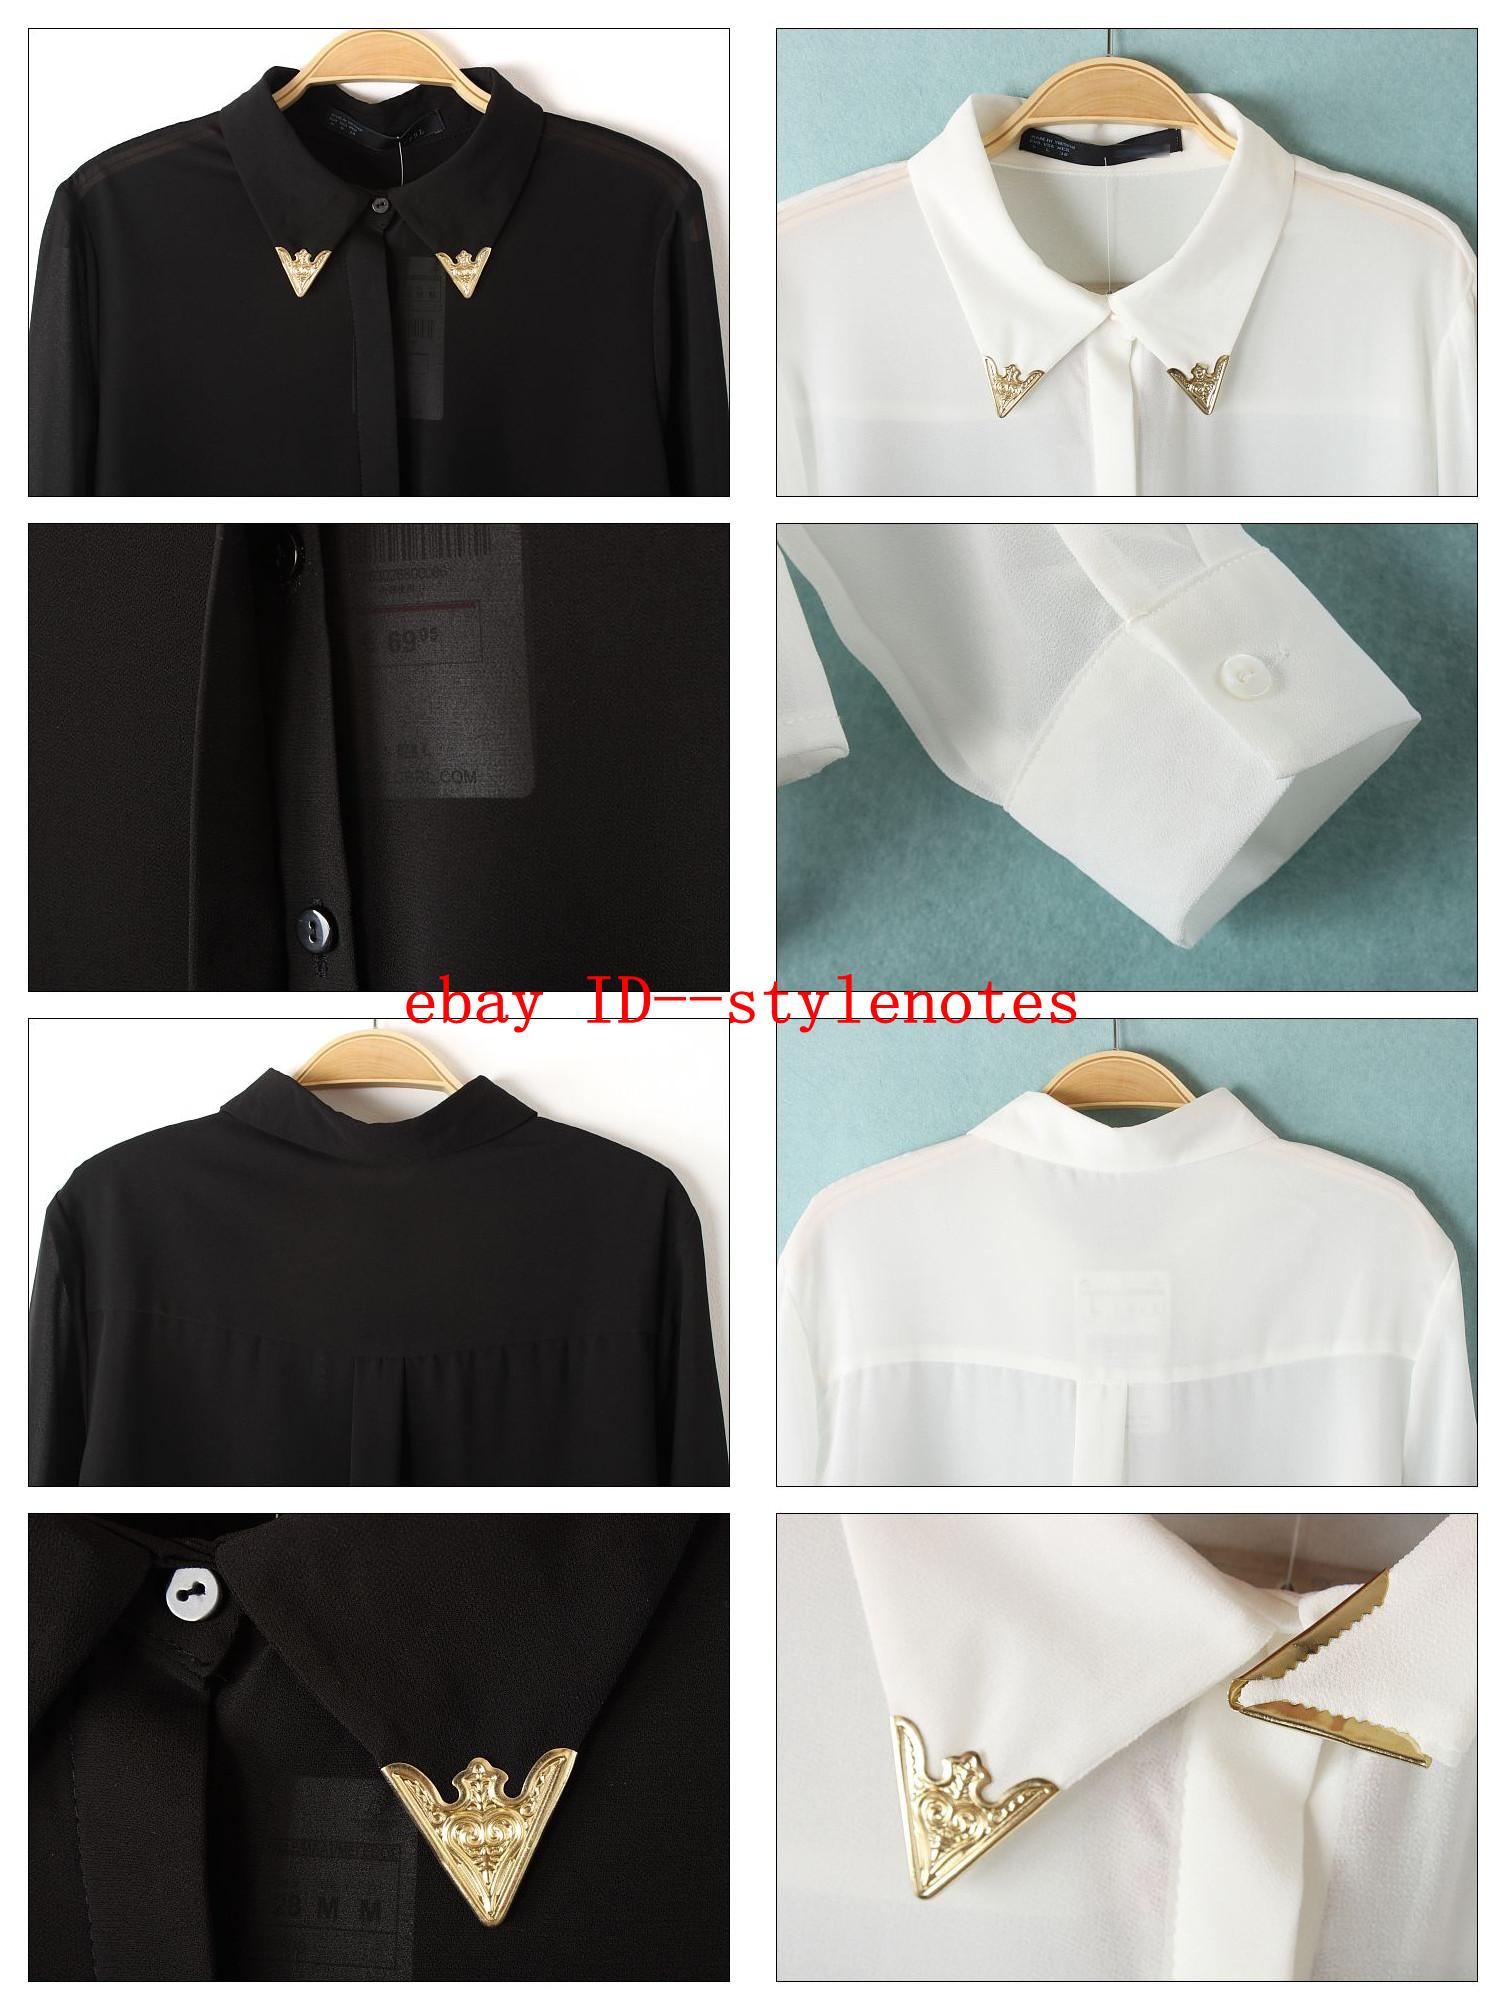 Semi Sheer Lightweight Metal Tips Classic Point Collar Long Sleeved Blouse Shirt   eBay